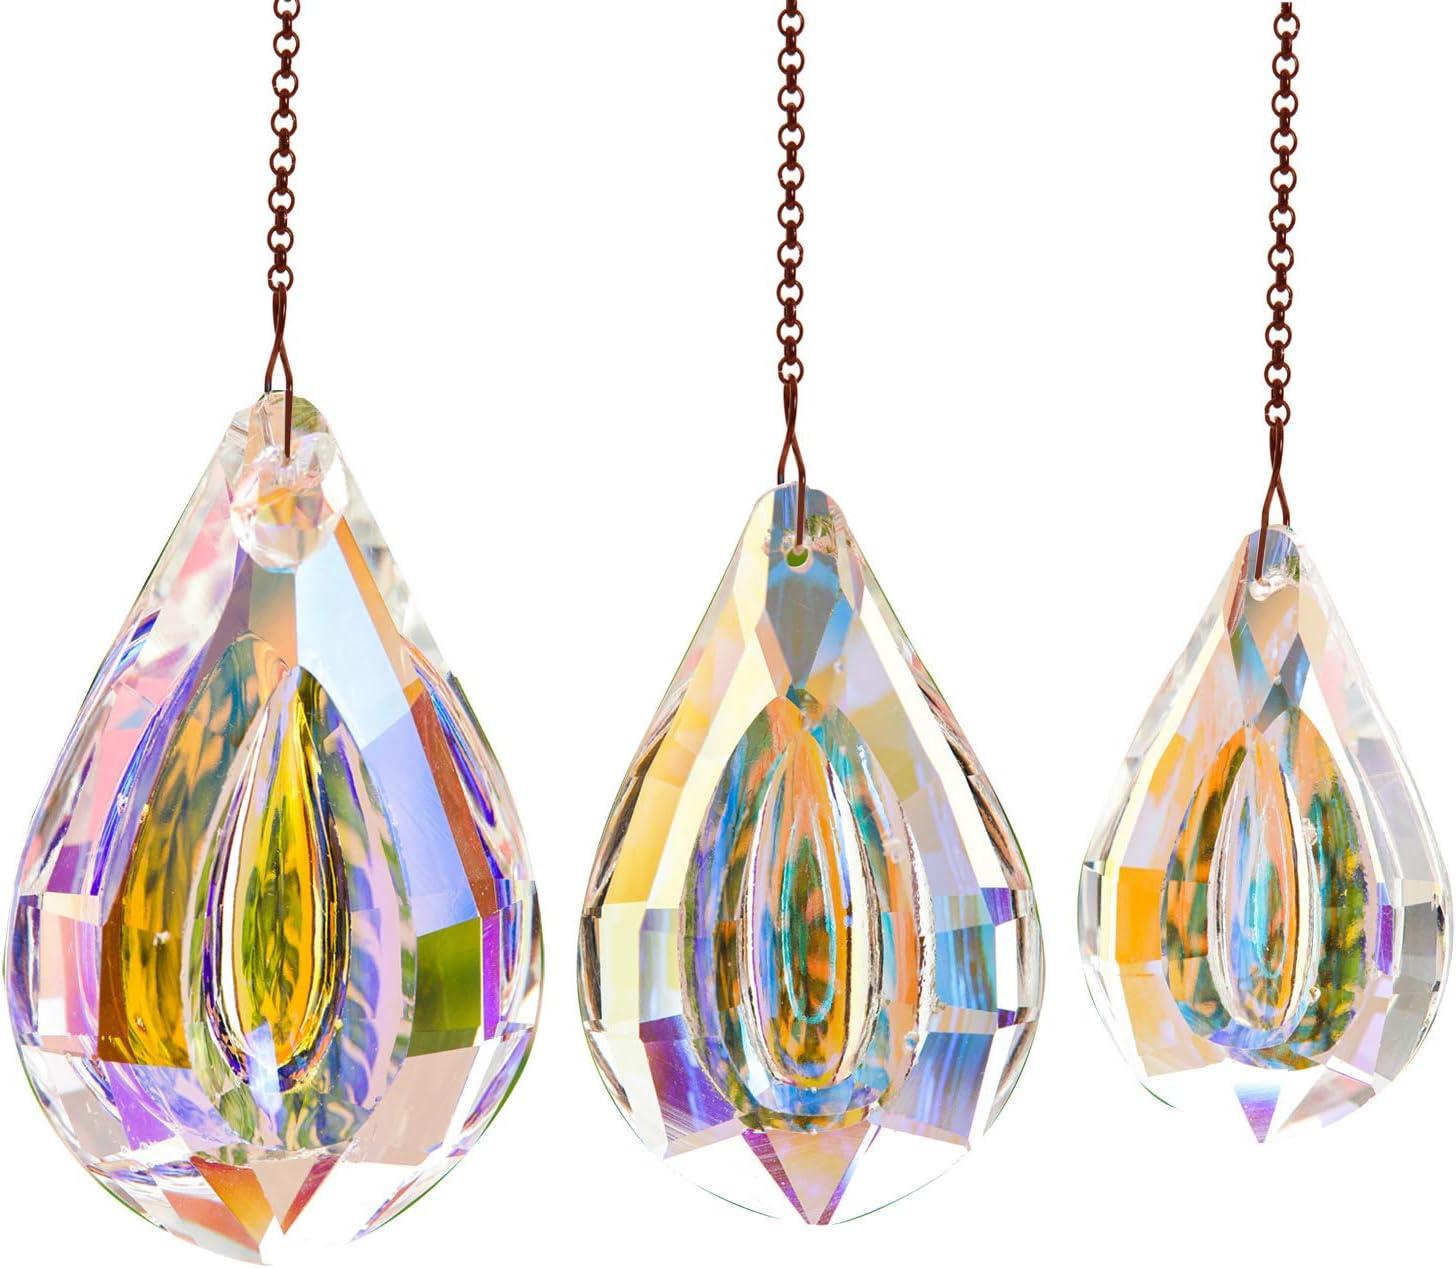 Together-life 3pcs Crystal Suncatcher Prism Pendant Rainbow Maker Hanging Suncatchers with Chain Window Sun Catcher for Christmas Wedding(AB Color)